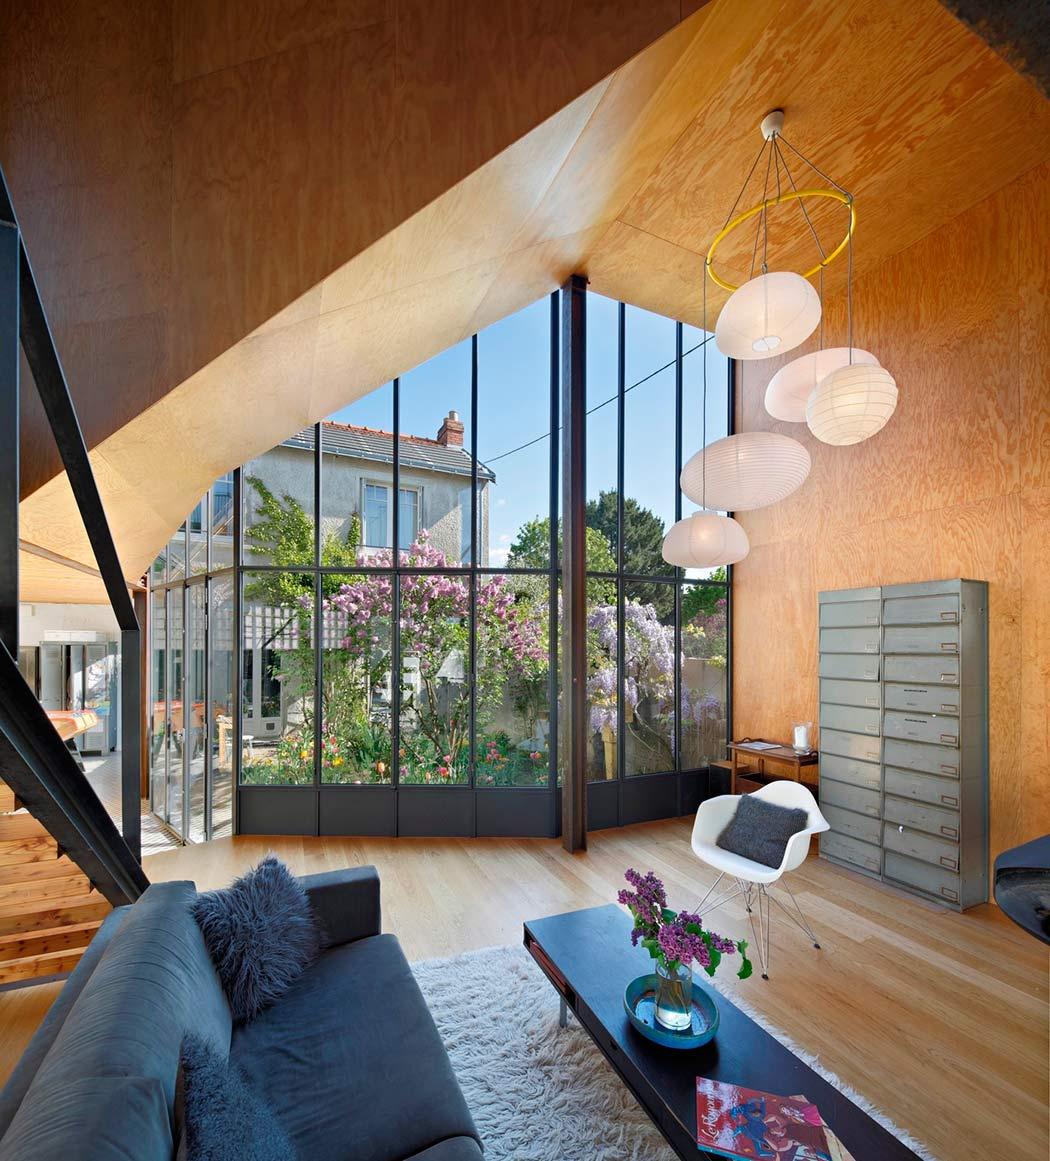 landscape-house-mabire-reich-architects-6